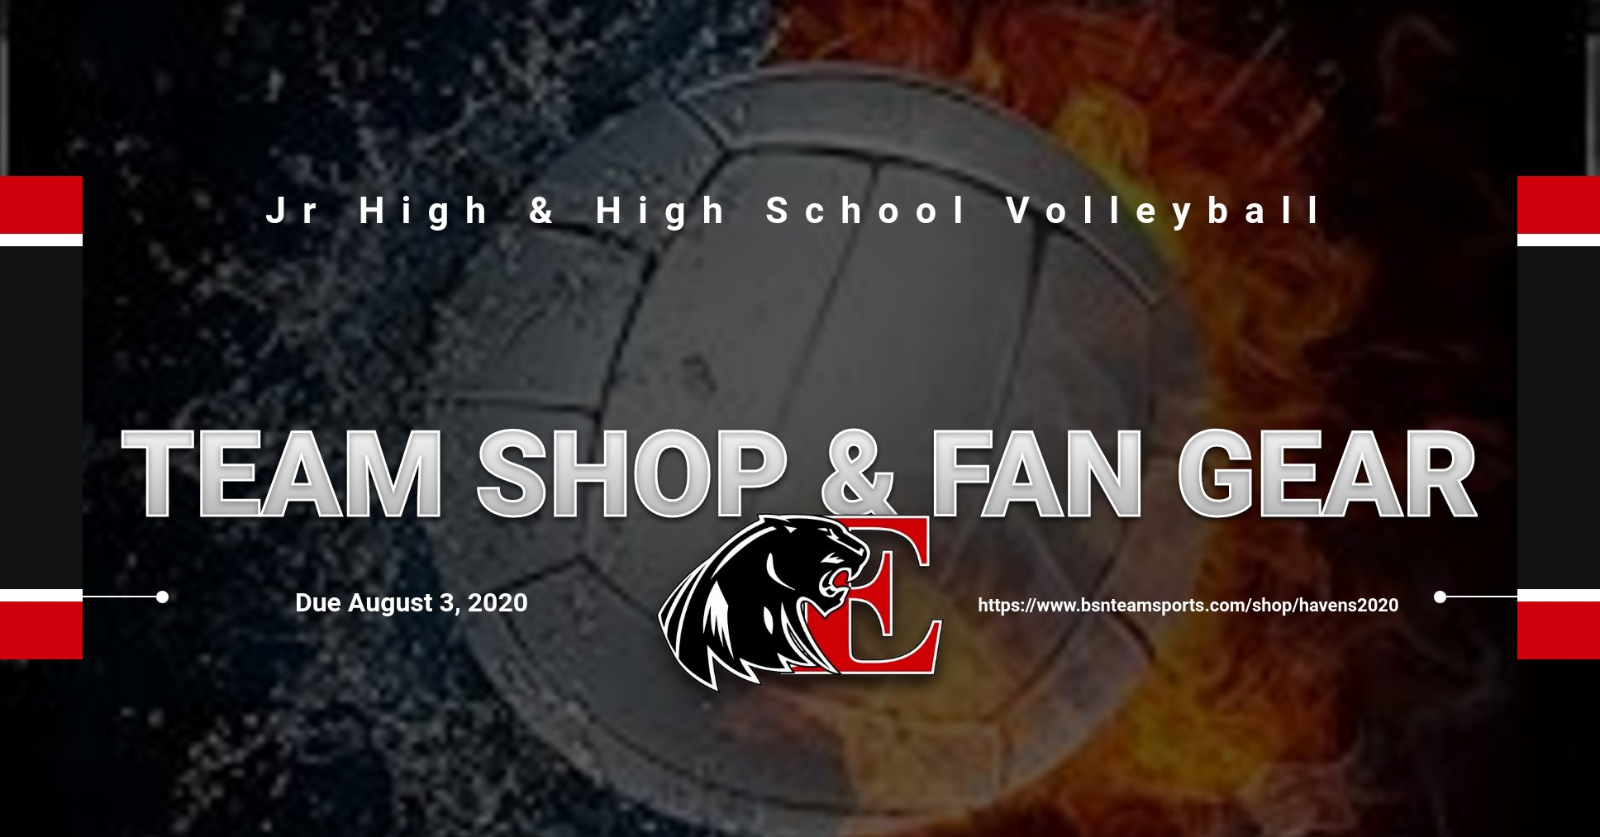 Jr. High & High School Volleyball Team Shop and Fan Gear